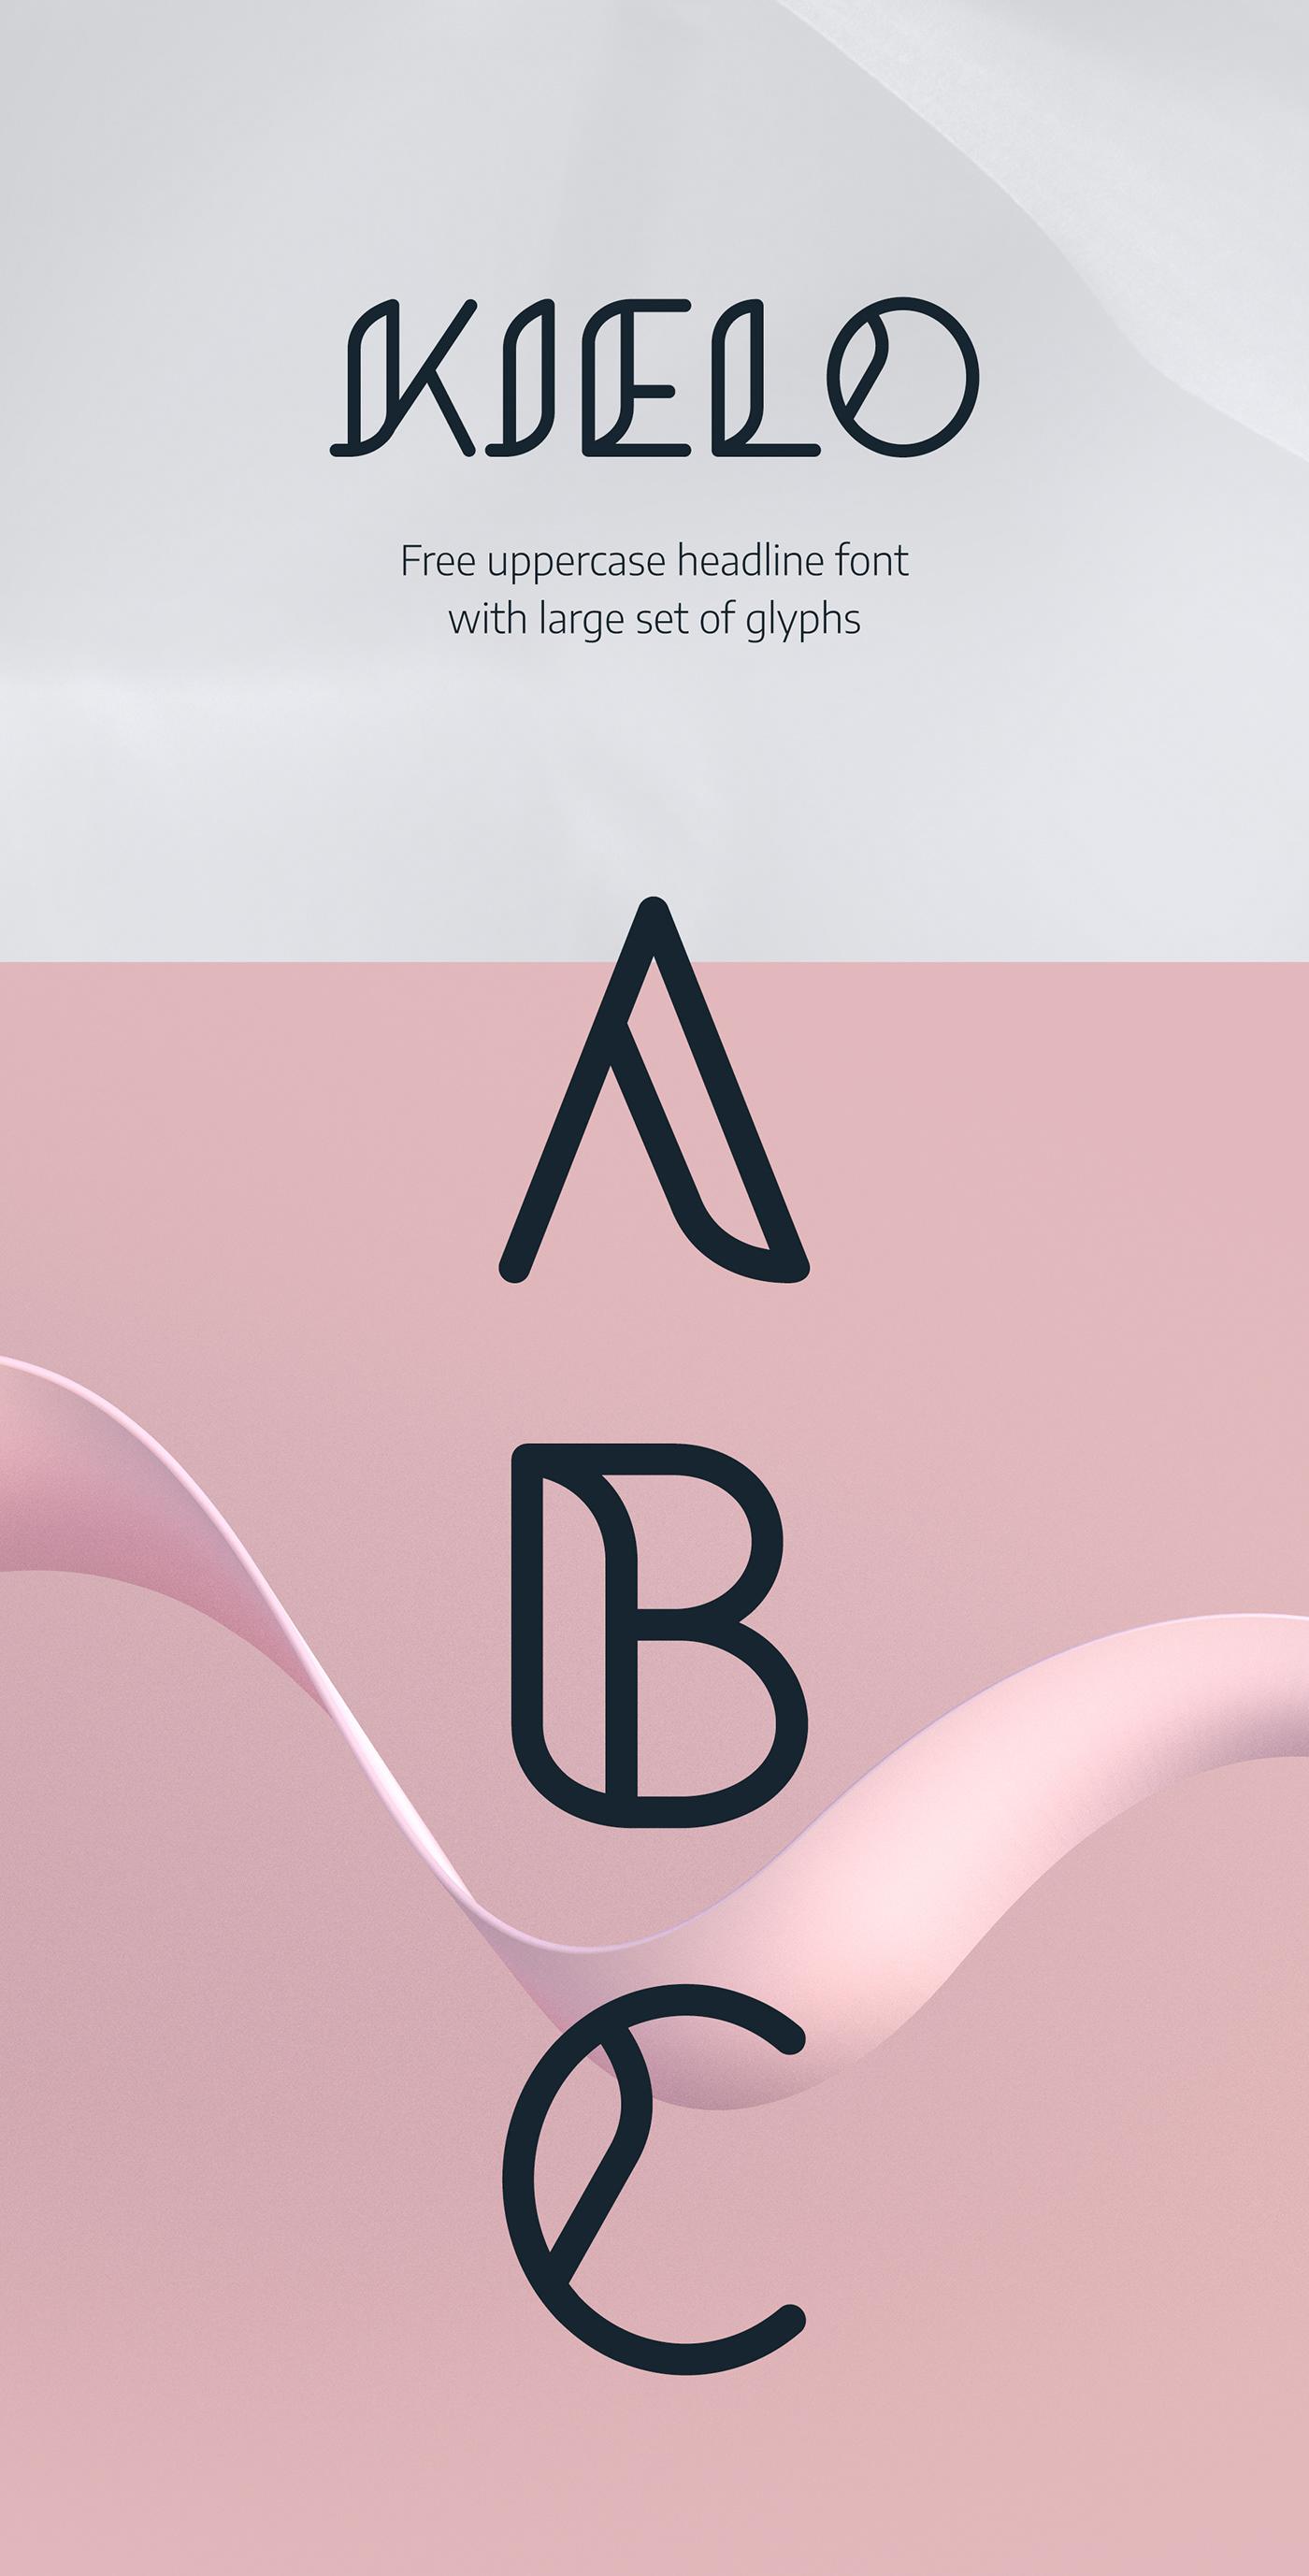 fonts font design Free font typography   custom type type design headline font font